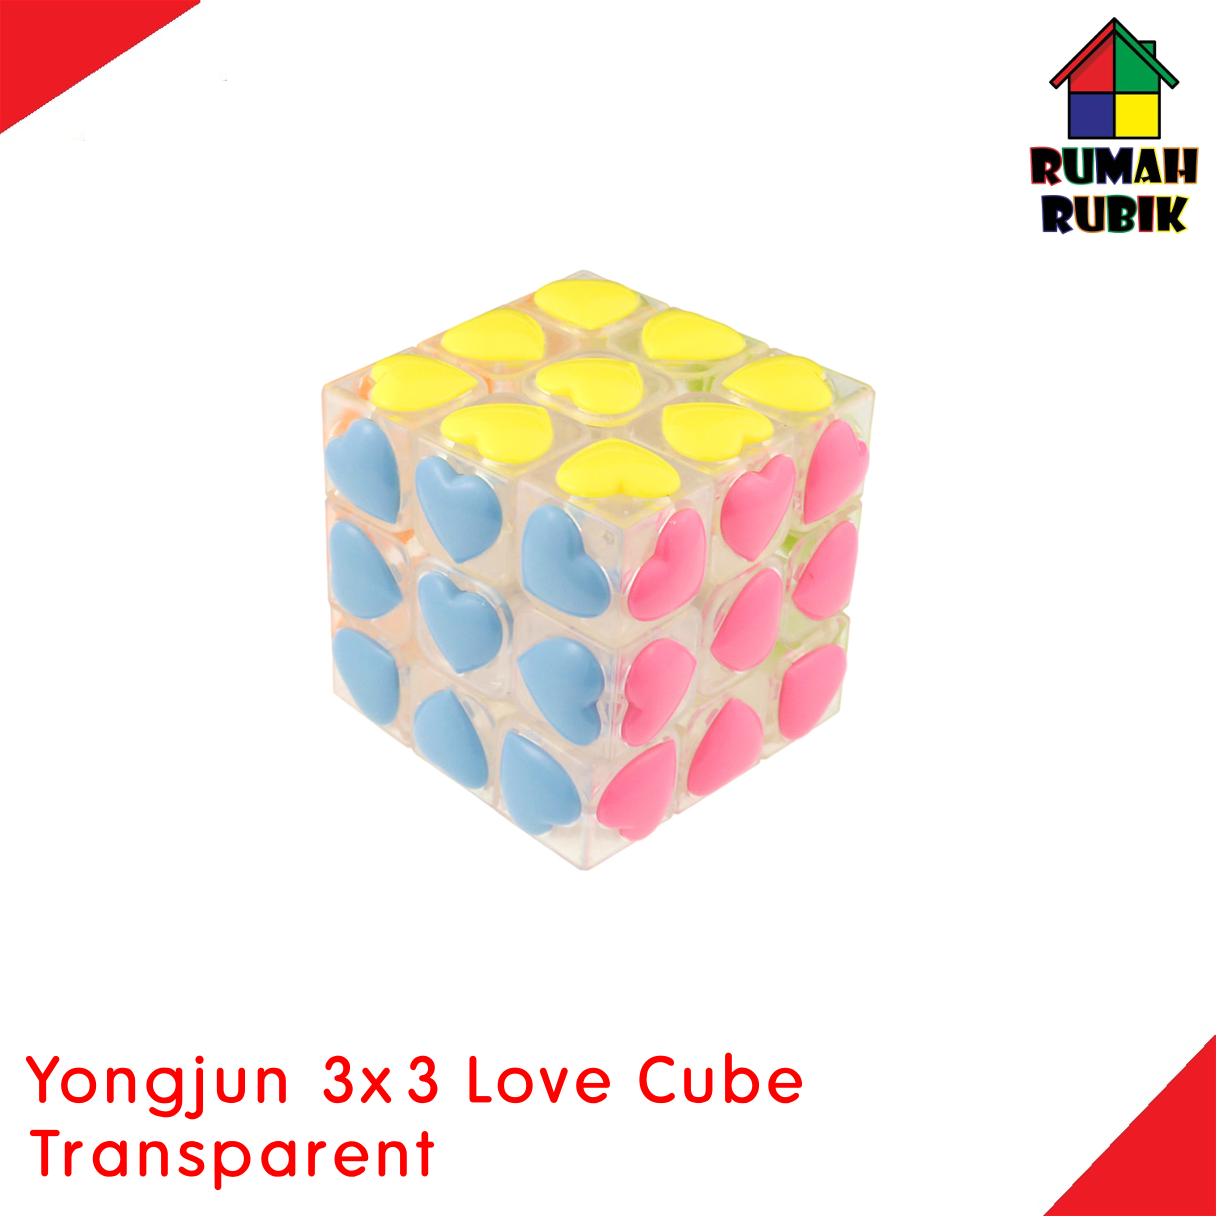 Jual Rubik 3x3 Yongjun Love Cube Transparent Murah